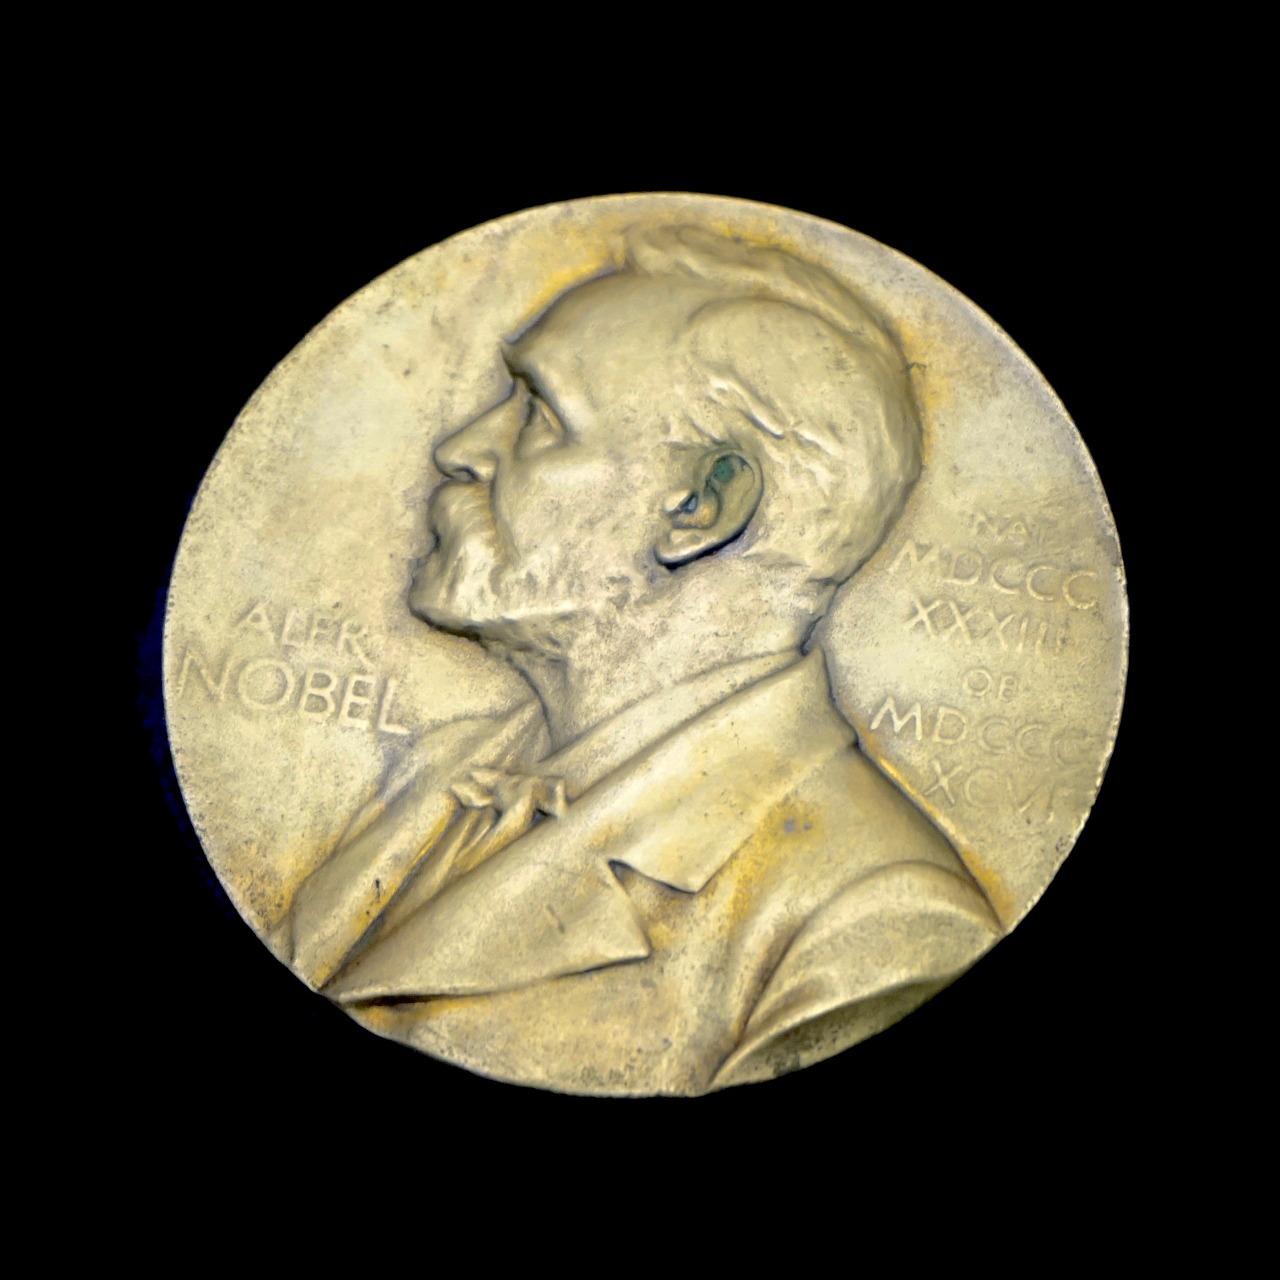 Pixabay/Florian Pircher: Nobelova cena